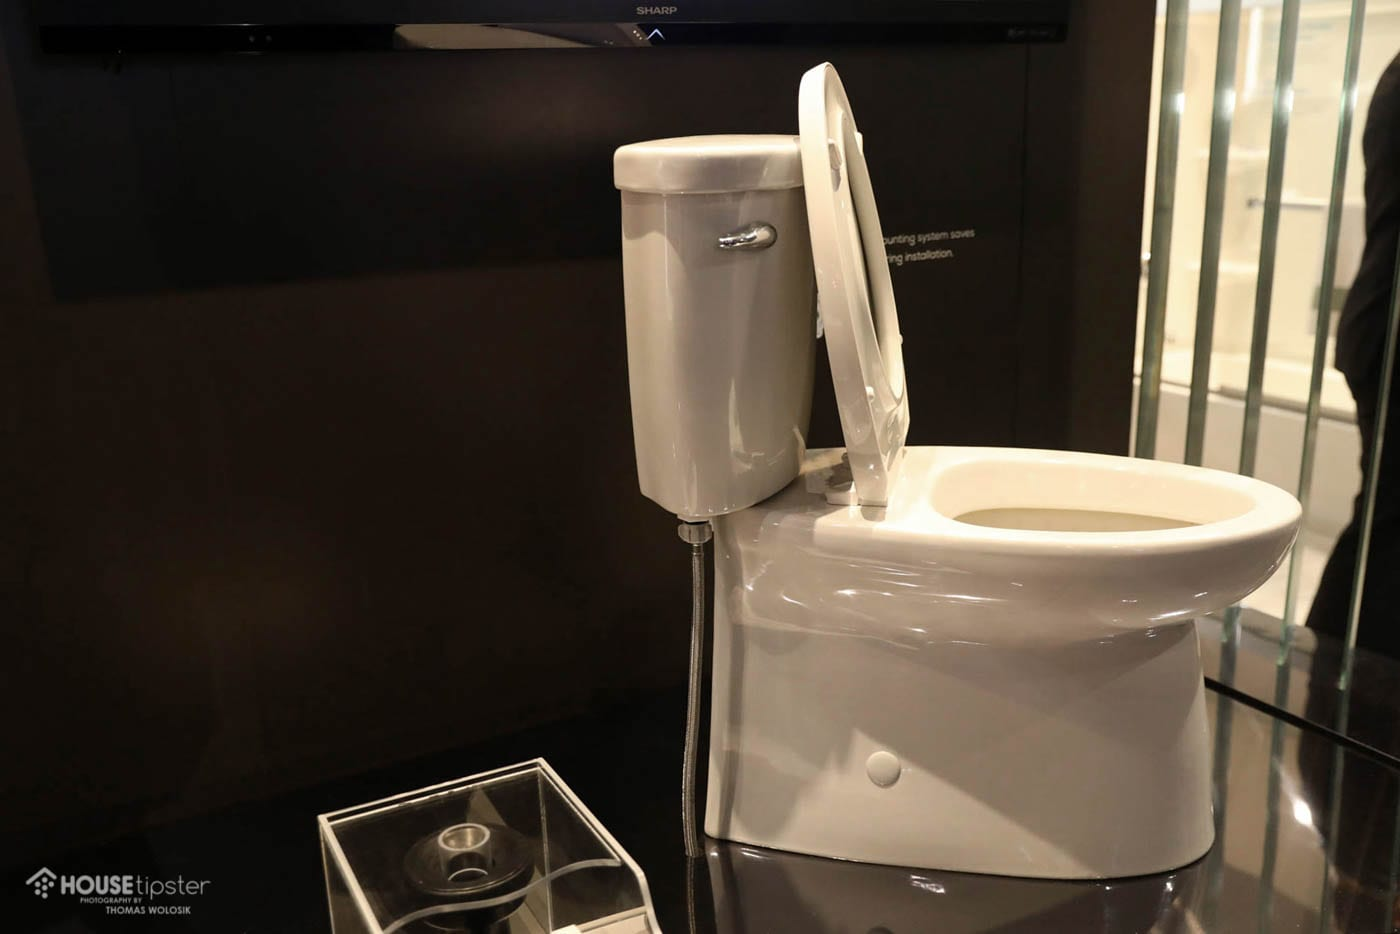 Kohler Showcases Innovative Sterling Bathroom Designs At